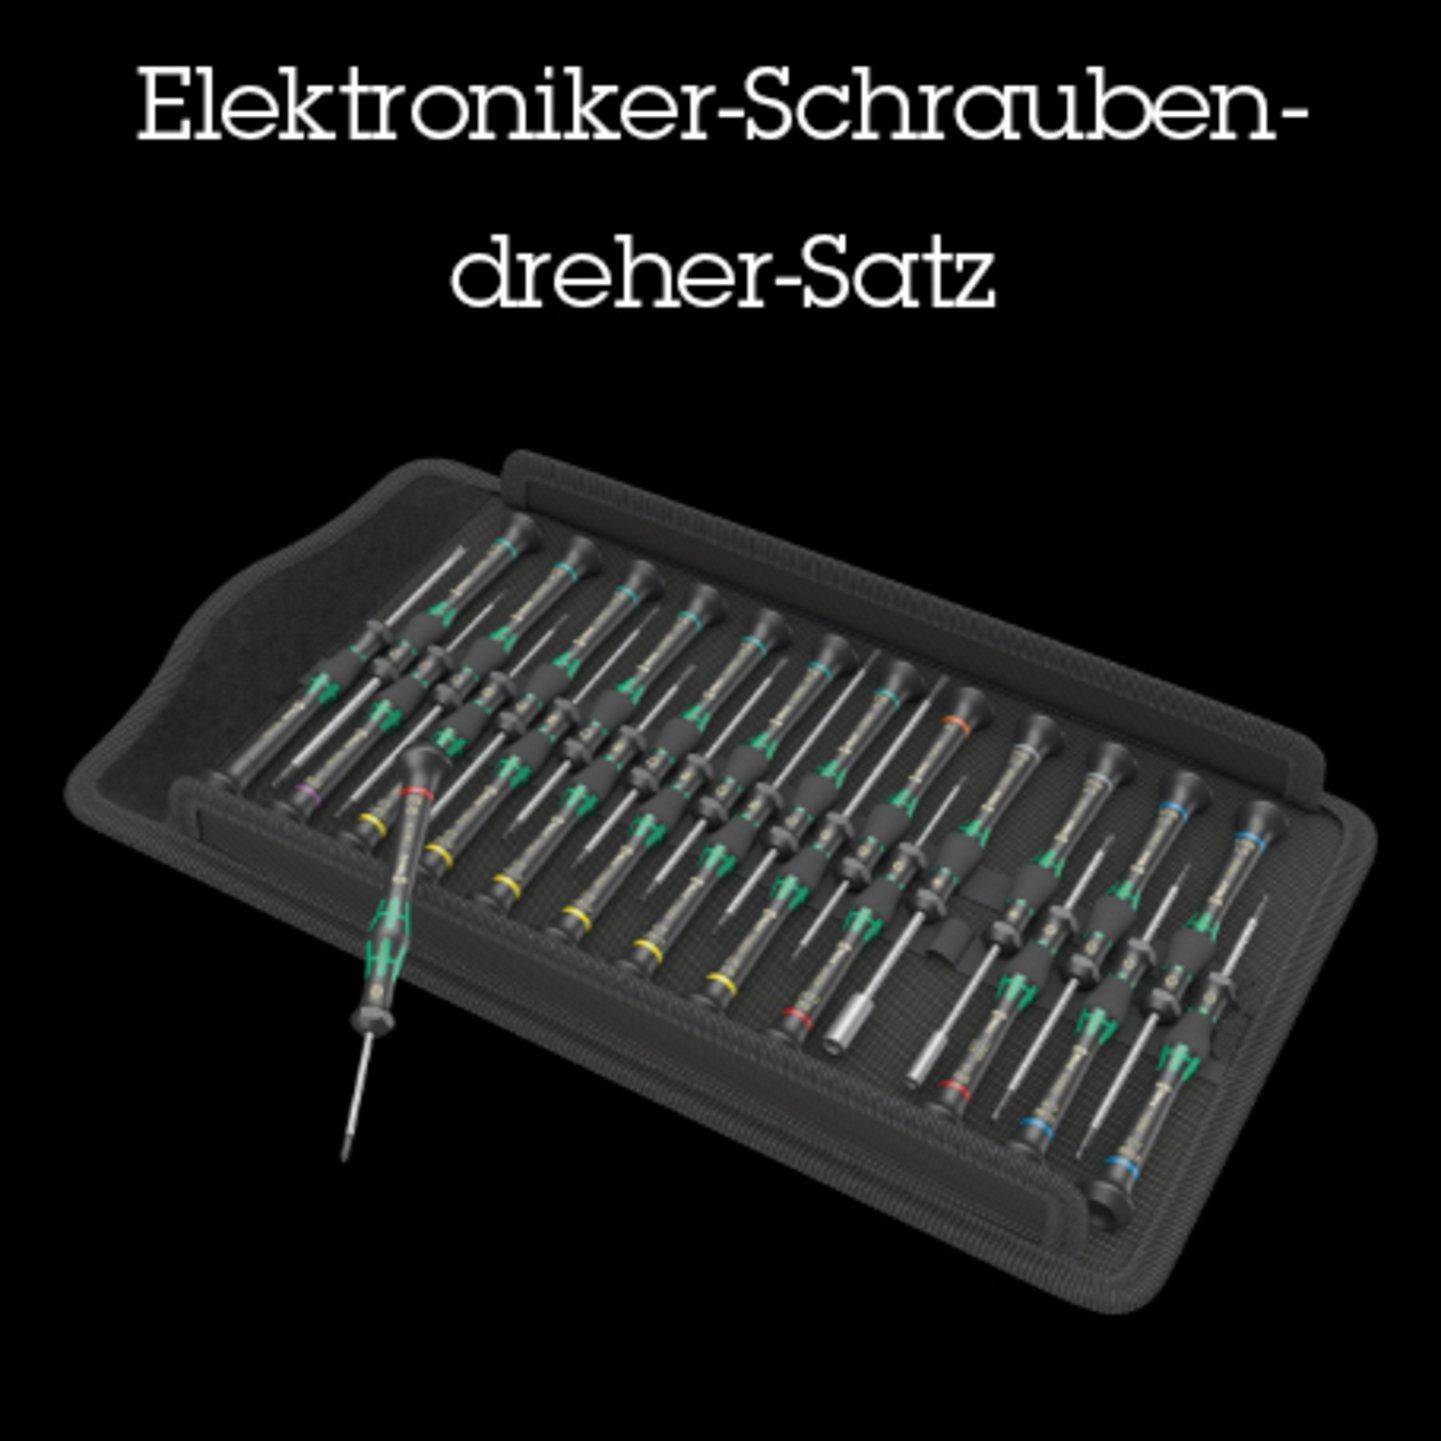 Elektroniker-Schraubendreher-Satz